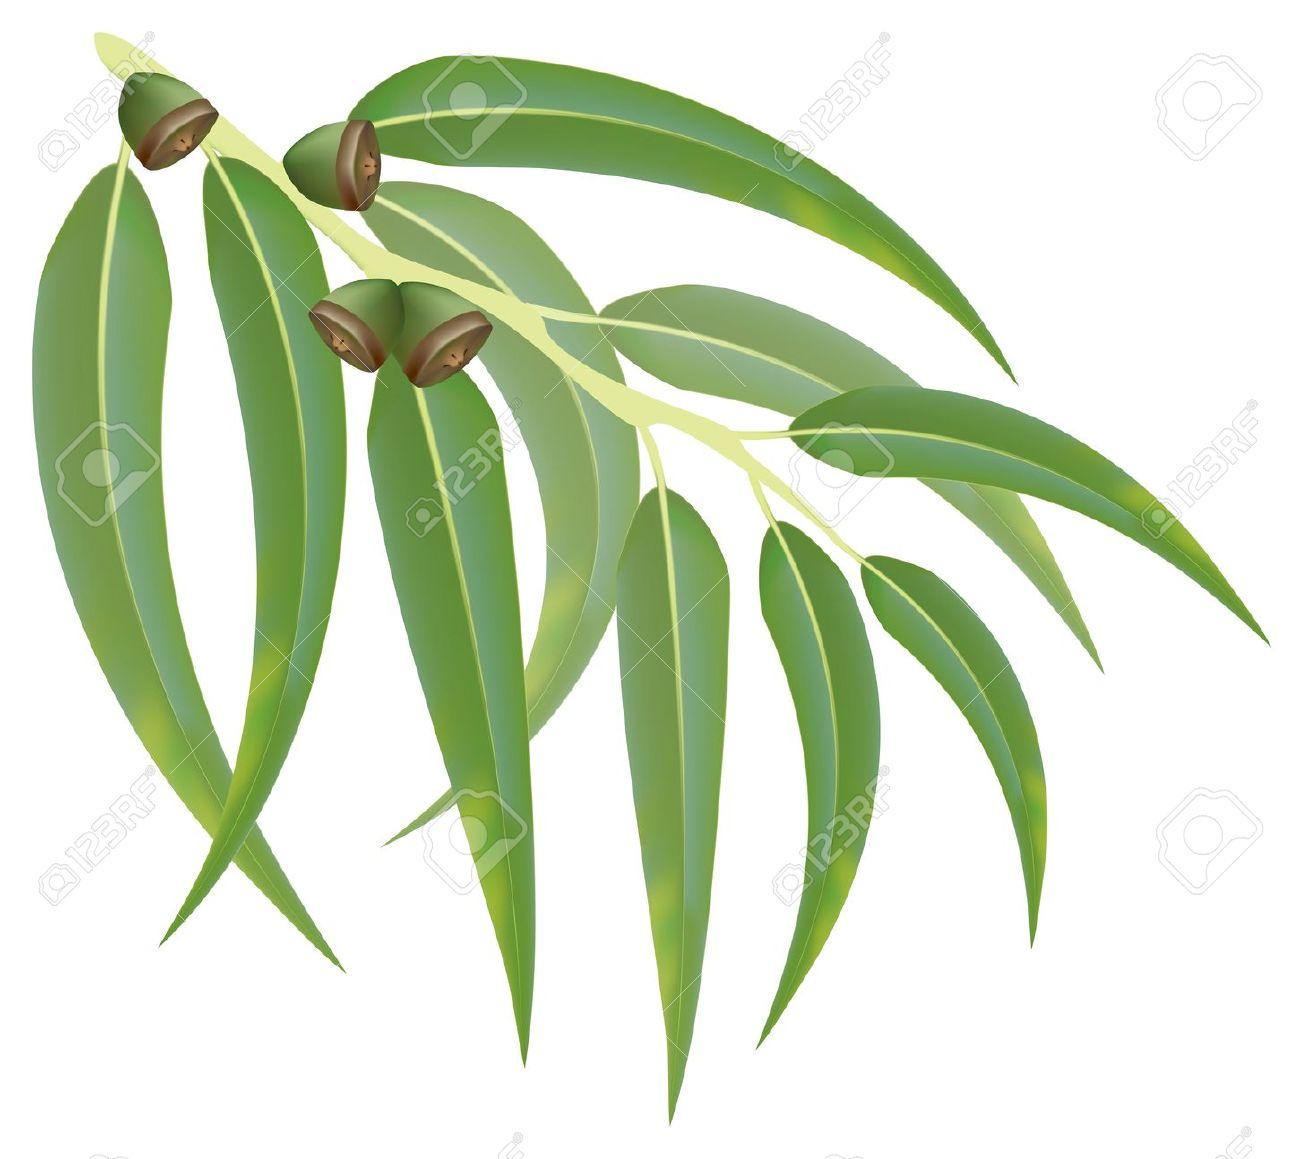 Eucalyptus clipart Eucalyptus Leaf Leaf Clipart Download